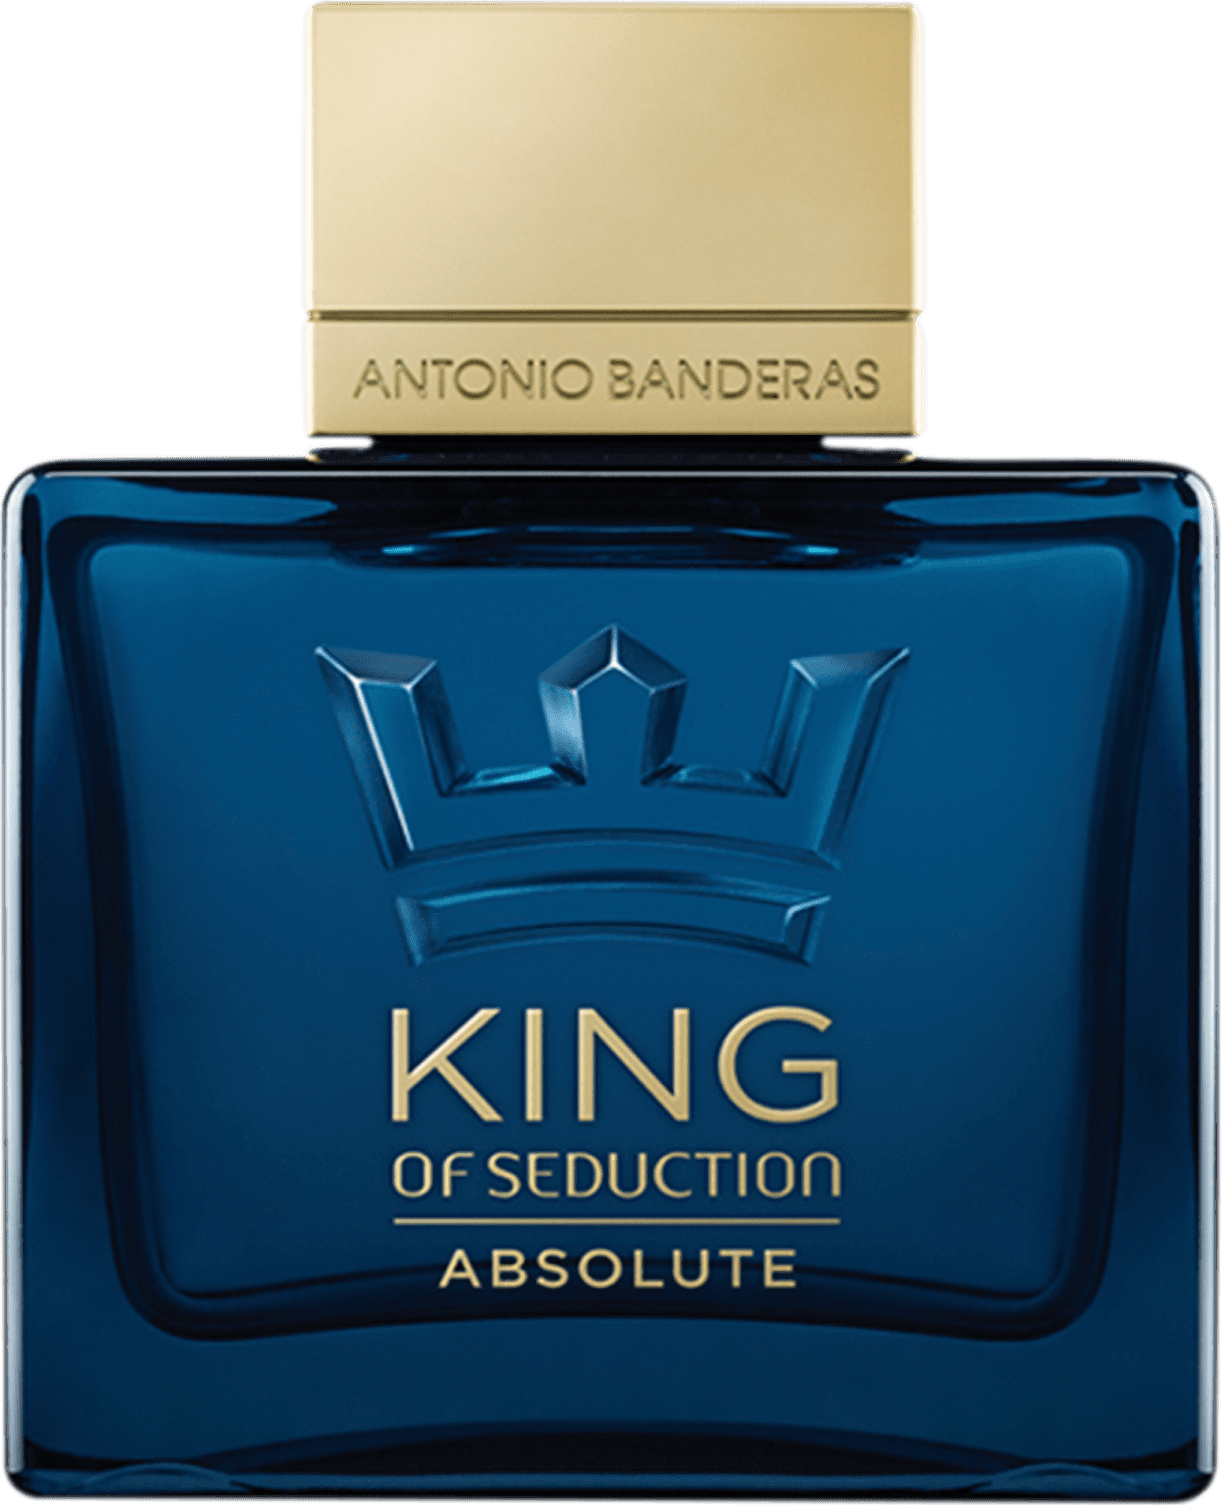 9184e8a32 King of Seduction Absolute Collector Antonio Banderas Eau de Toilette - Perfume  Masculino 100ml